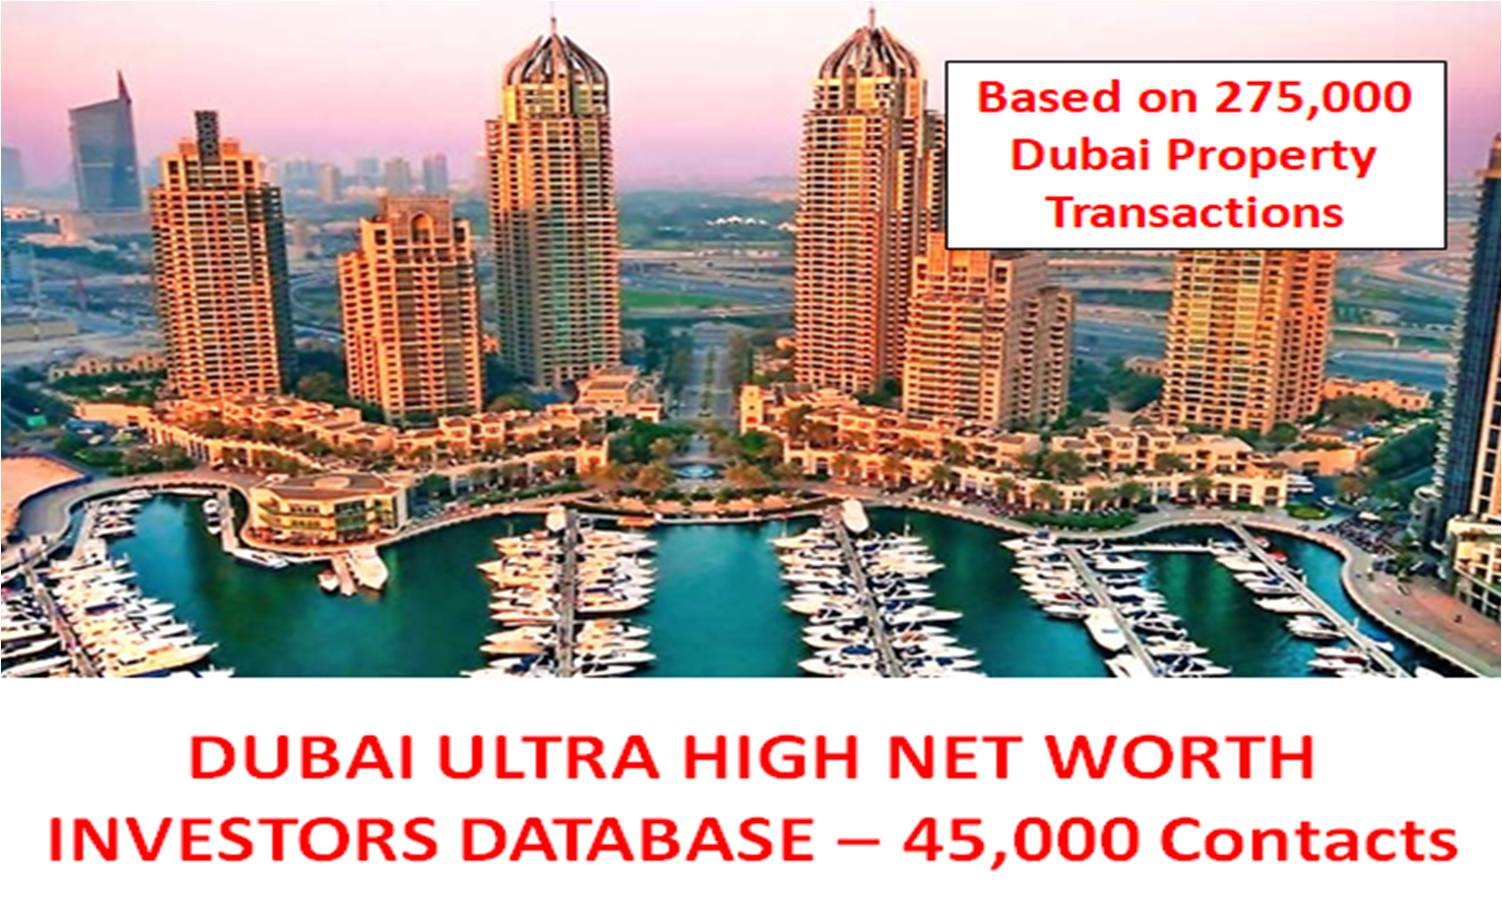 Dubai Ultra High Net Worth Investors List